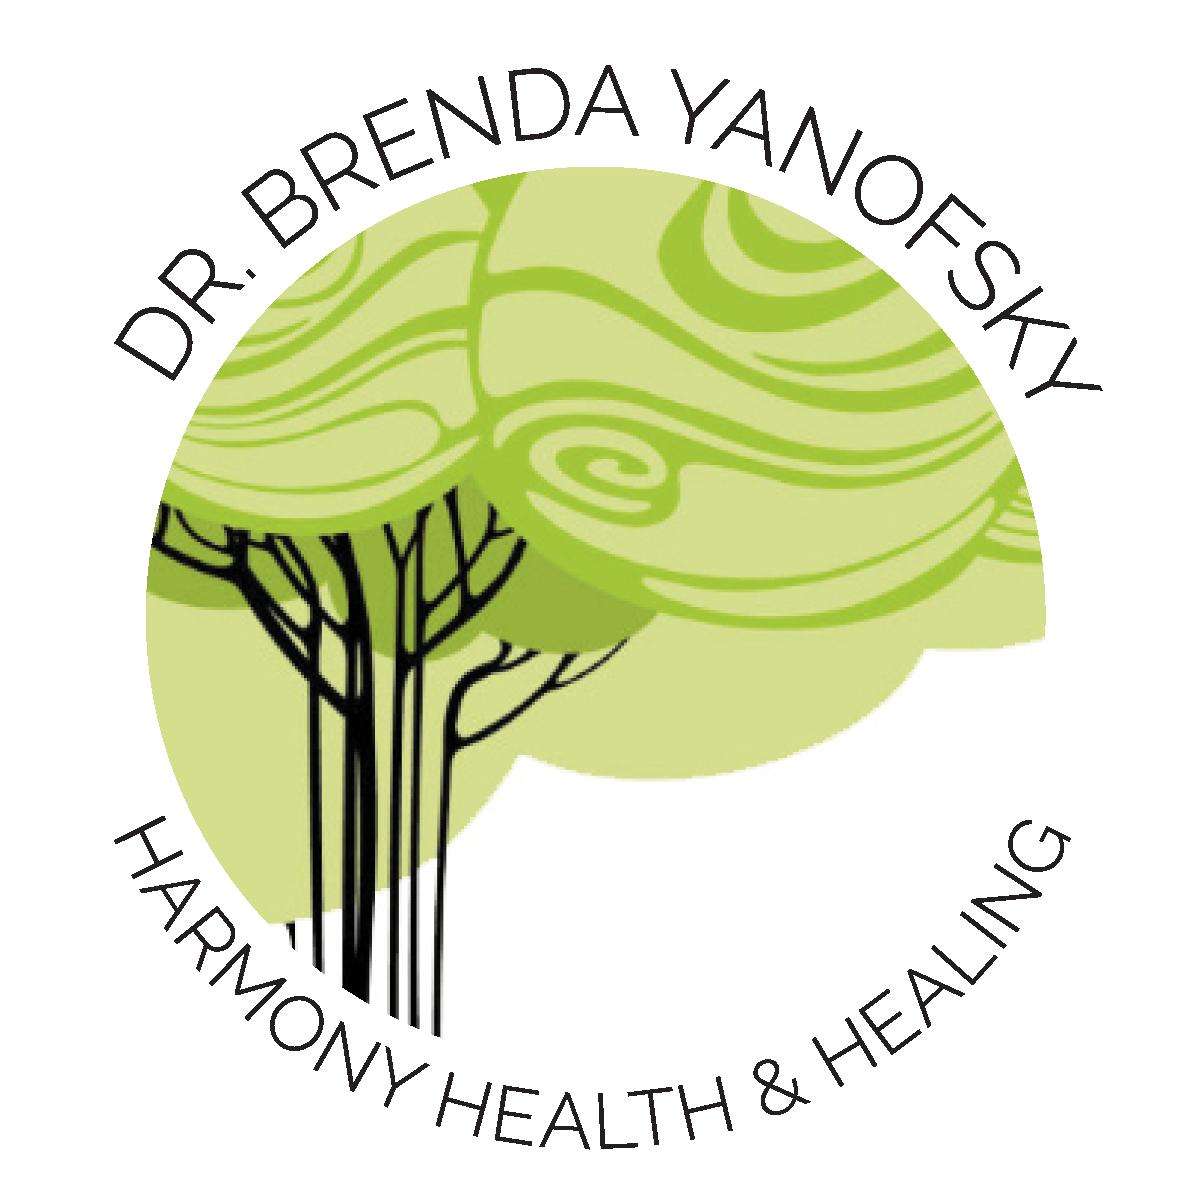 Dr. Brenda Harmony Health & Healing, Inc. Sarasota, Bradenton FL